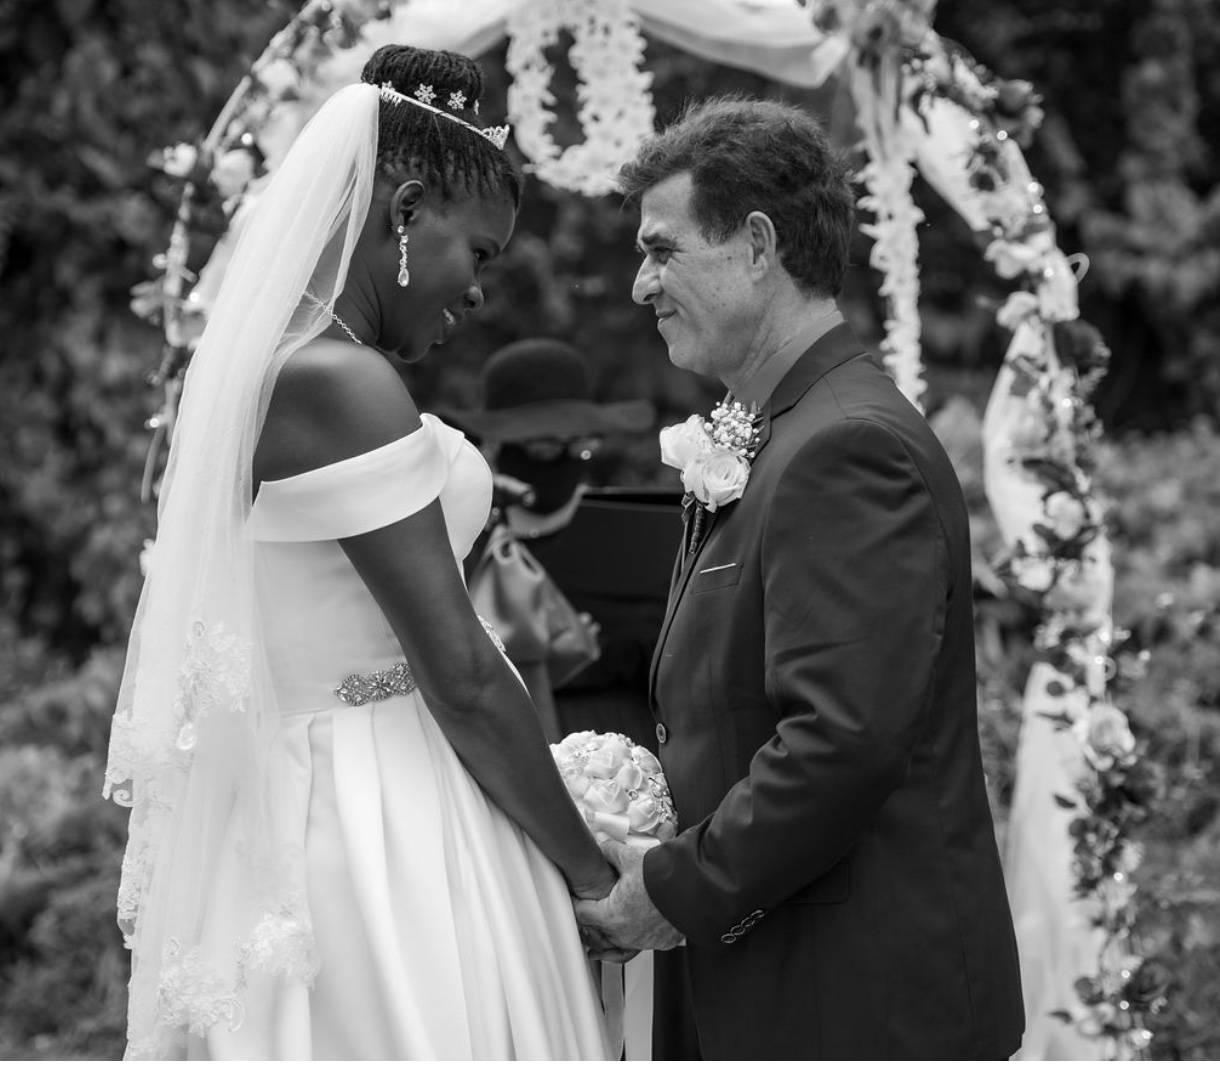 Mr. and Mrs. Philip Santo